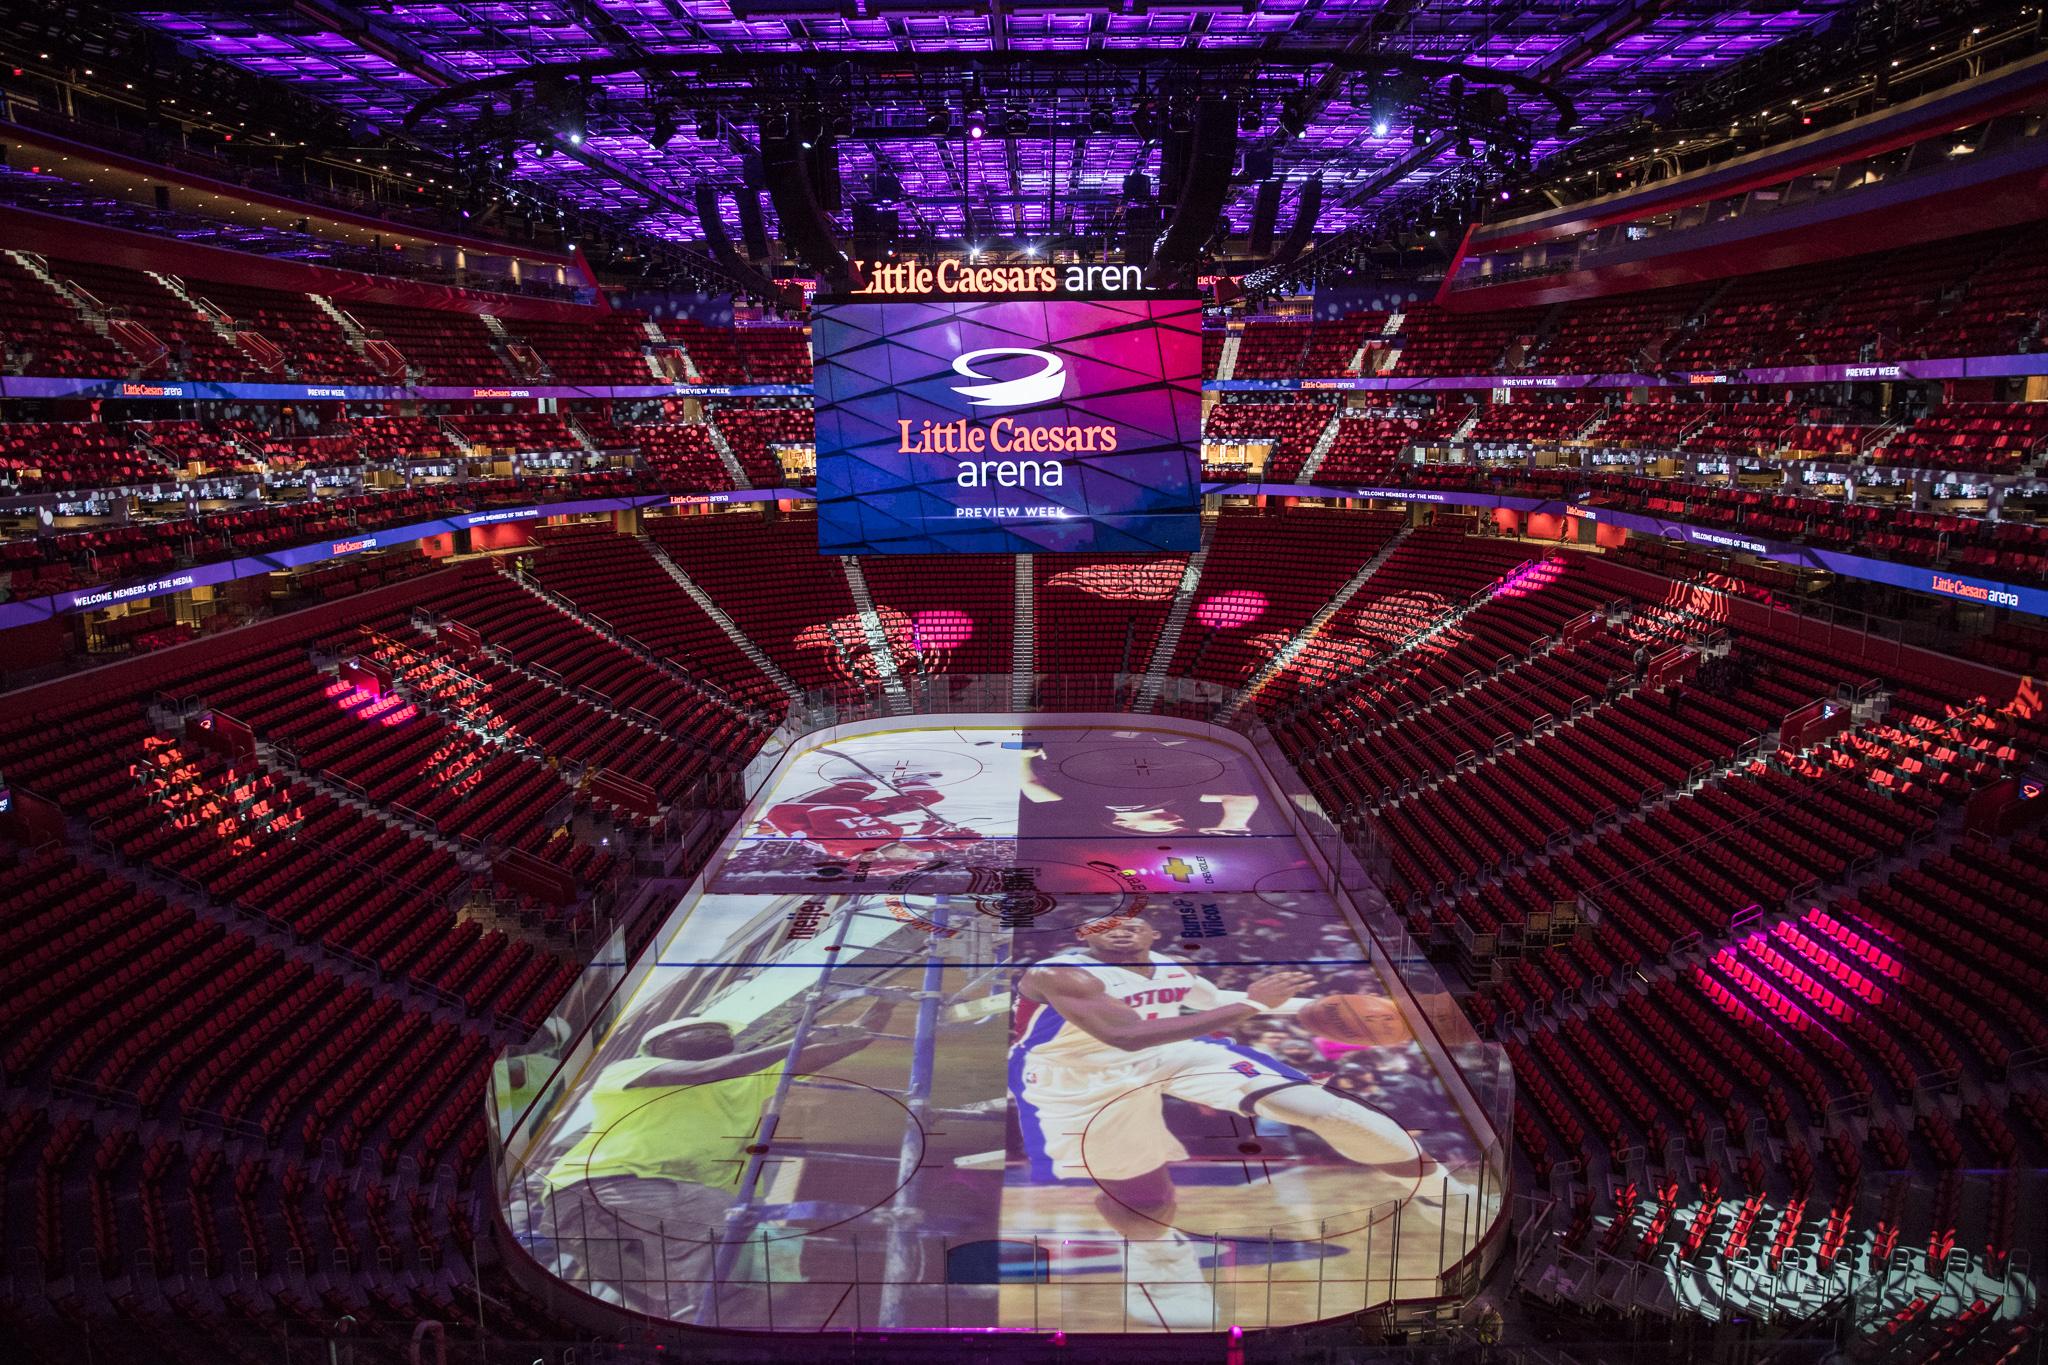 Little Caesars Arena Tour Detroits newest sports venue Curbed